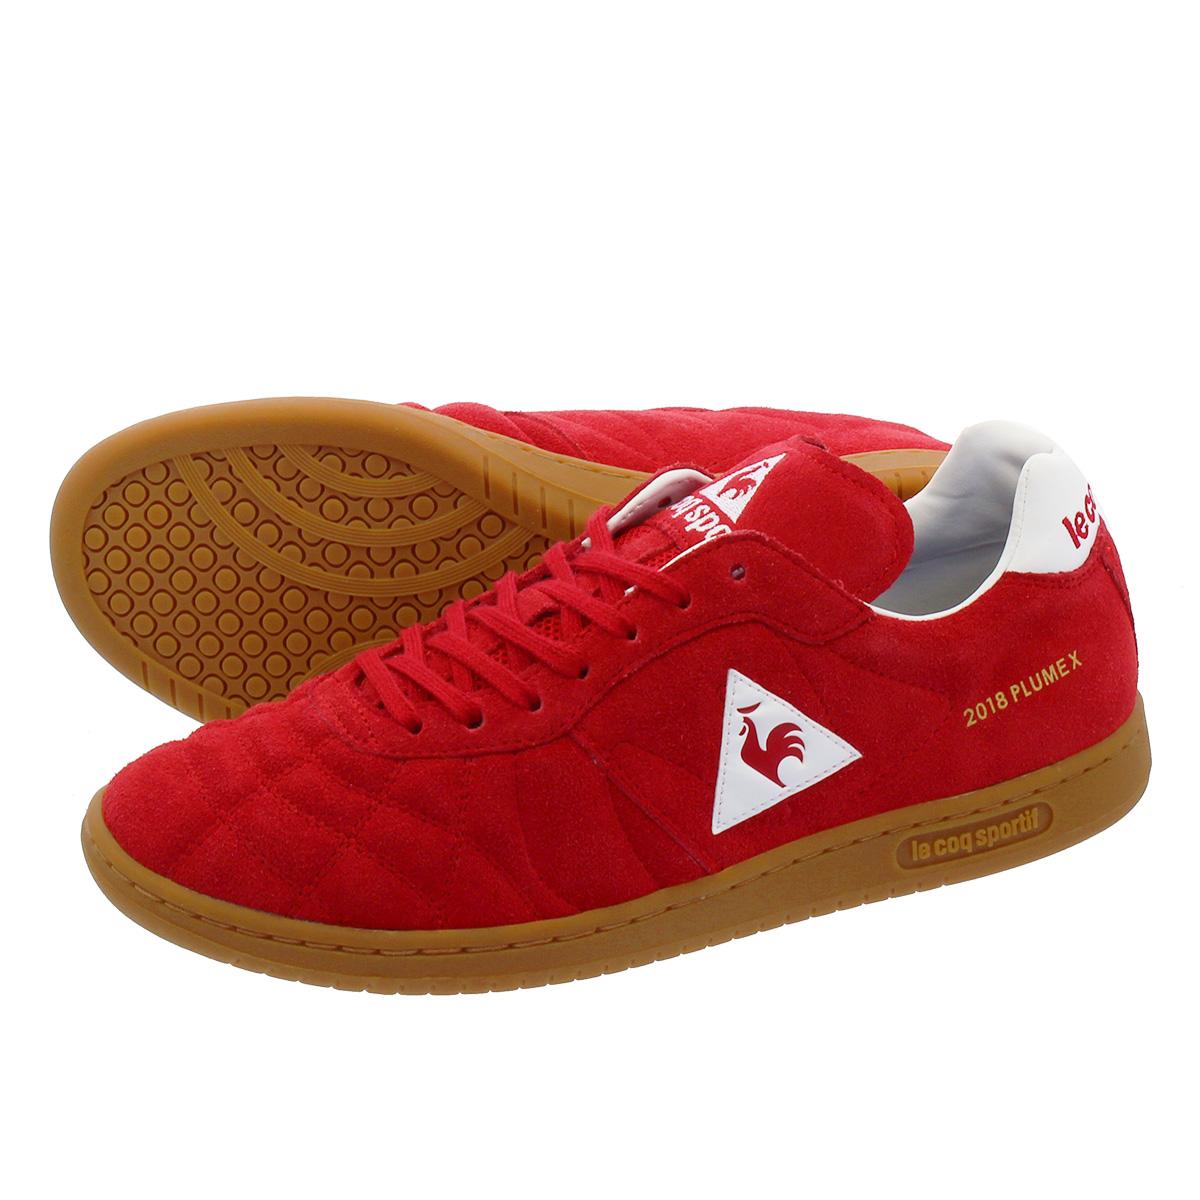 le coq sportif PLUME X ルコック スポルティフ プリューム X RED SUEDE ql1mjc51r